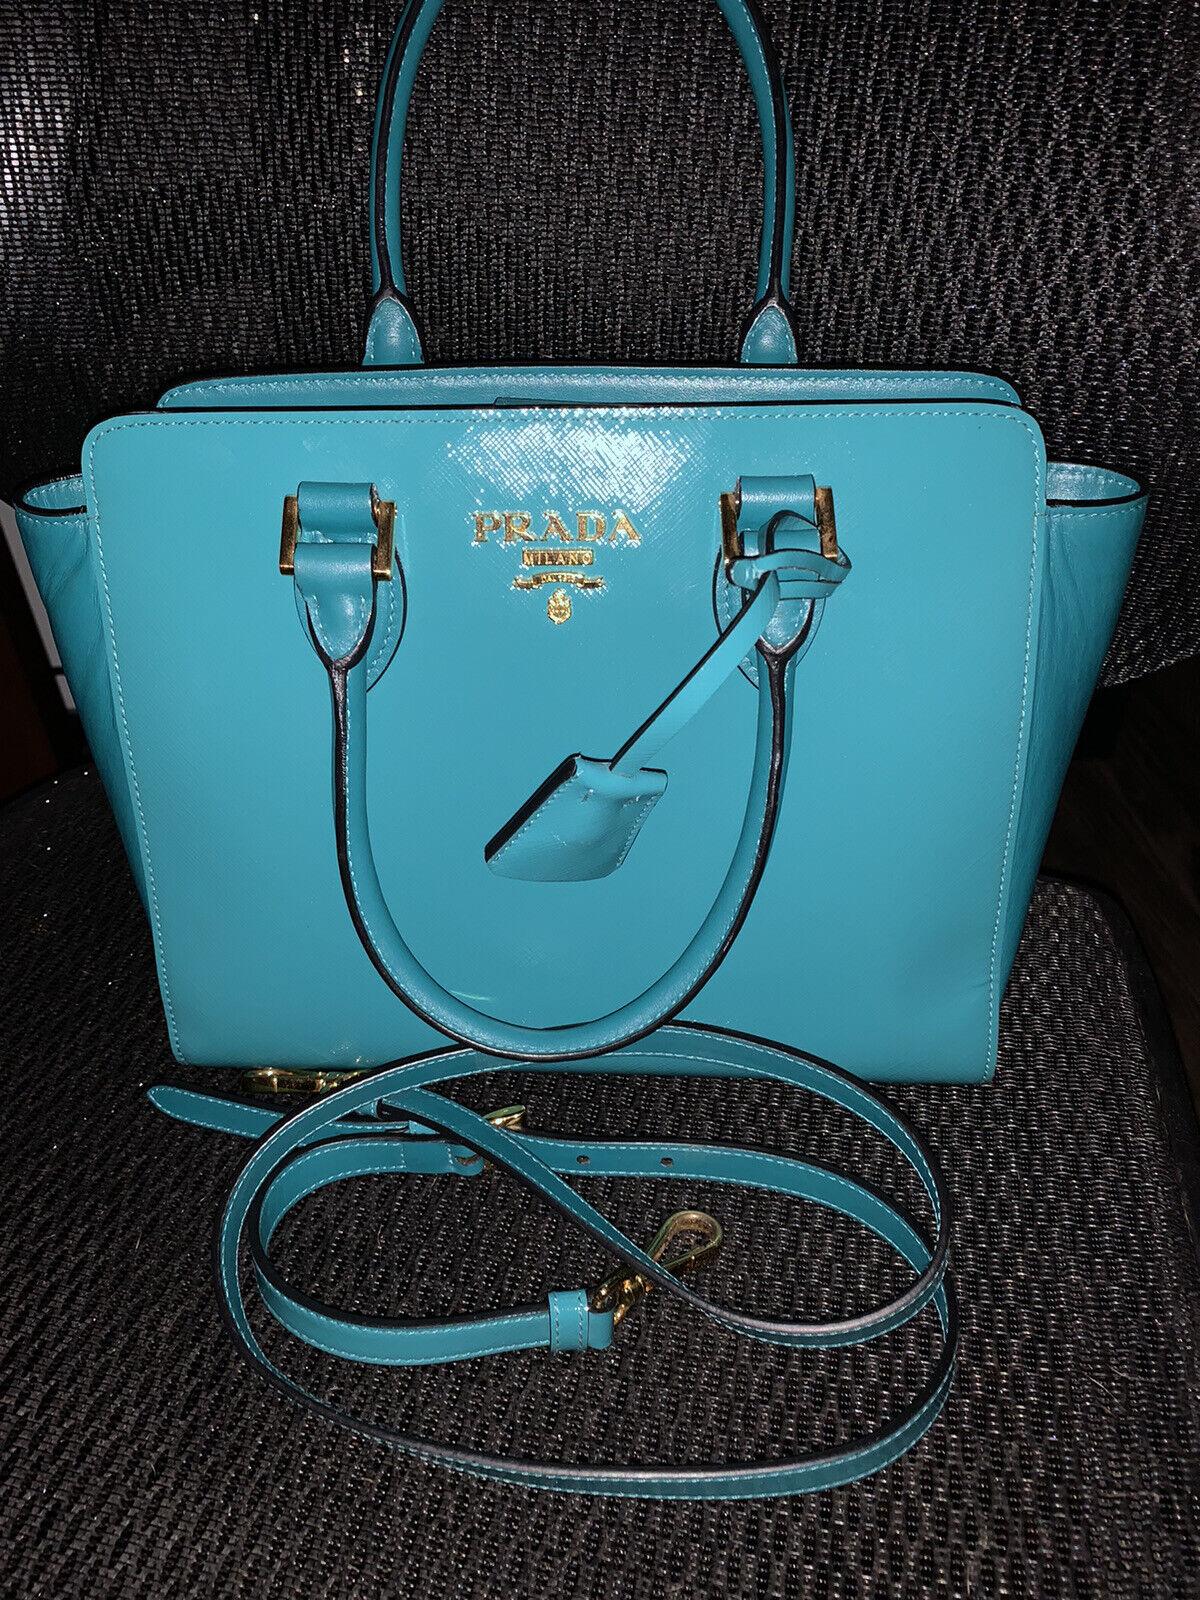 prada leather crossbody bag - image 1